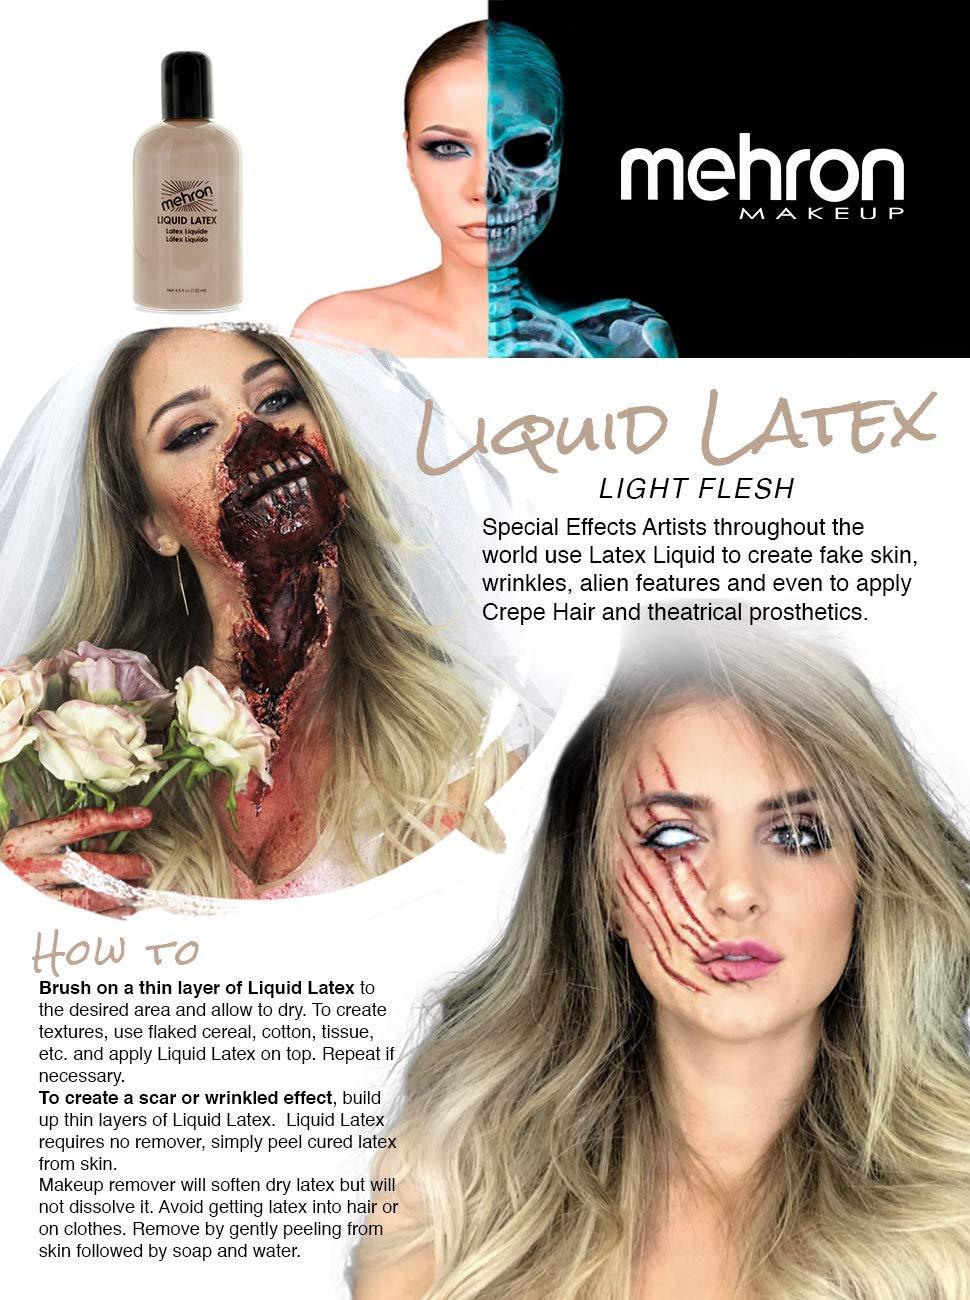 Apply liquid latex